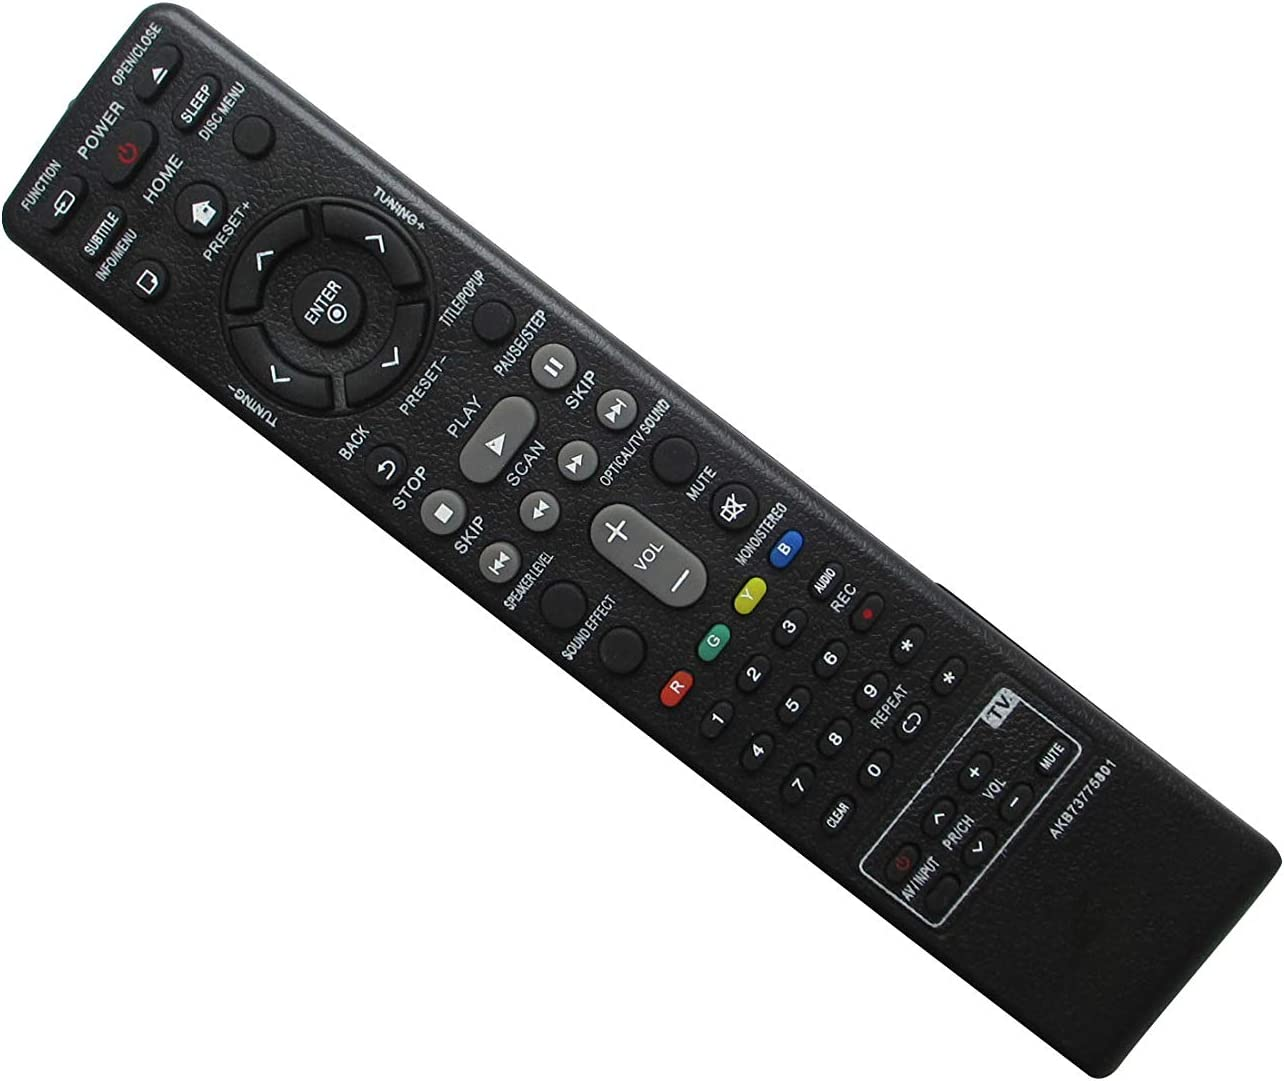 HCDZ Replacement Remote Control for LG Zenith 6710CDAL01C DVT412 6710CDAL01B DVT418 DVT312 DVT310 ZHD-311 DVD Player Home Theater System